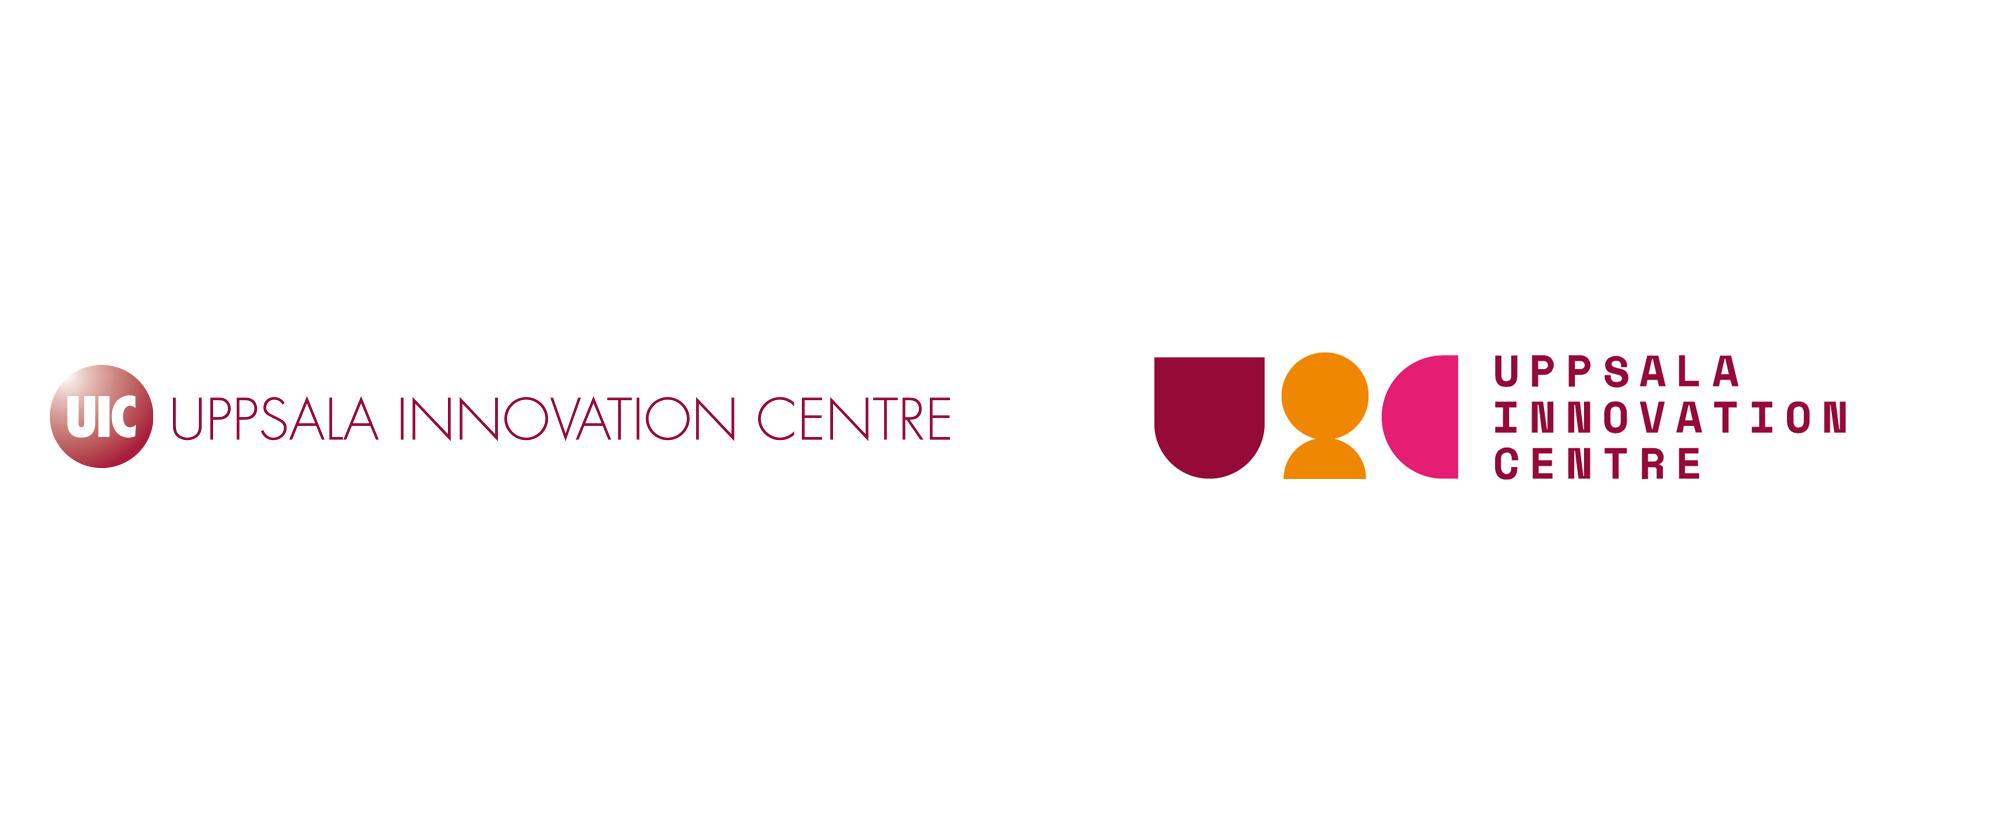 New Logo and Identity for Uppsala Innovation Centre by Jesper Holm